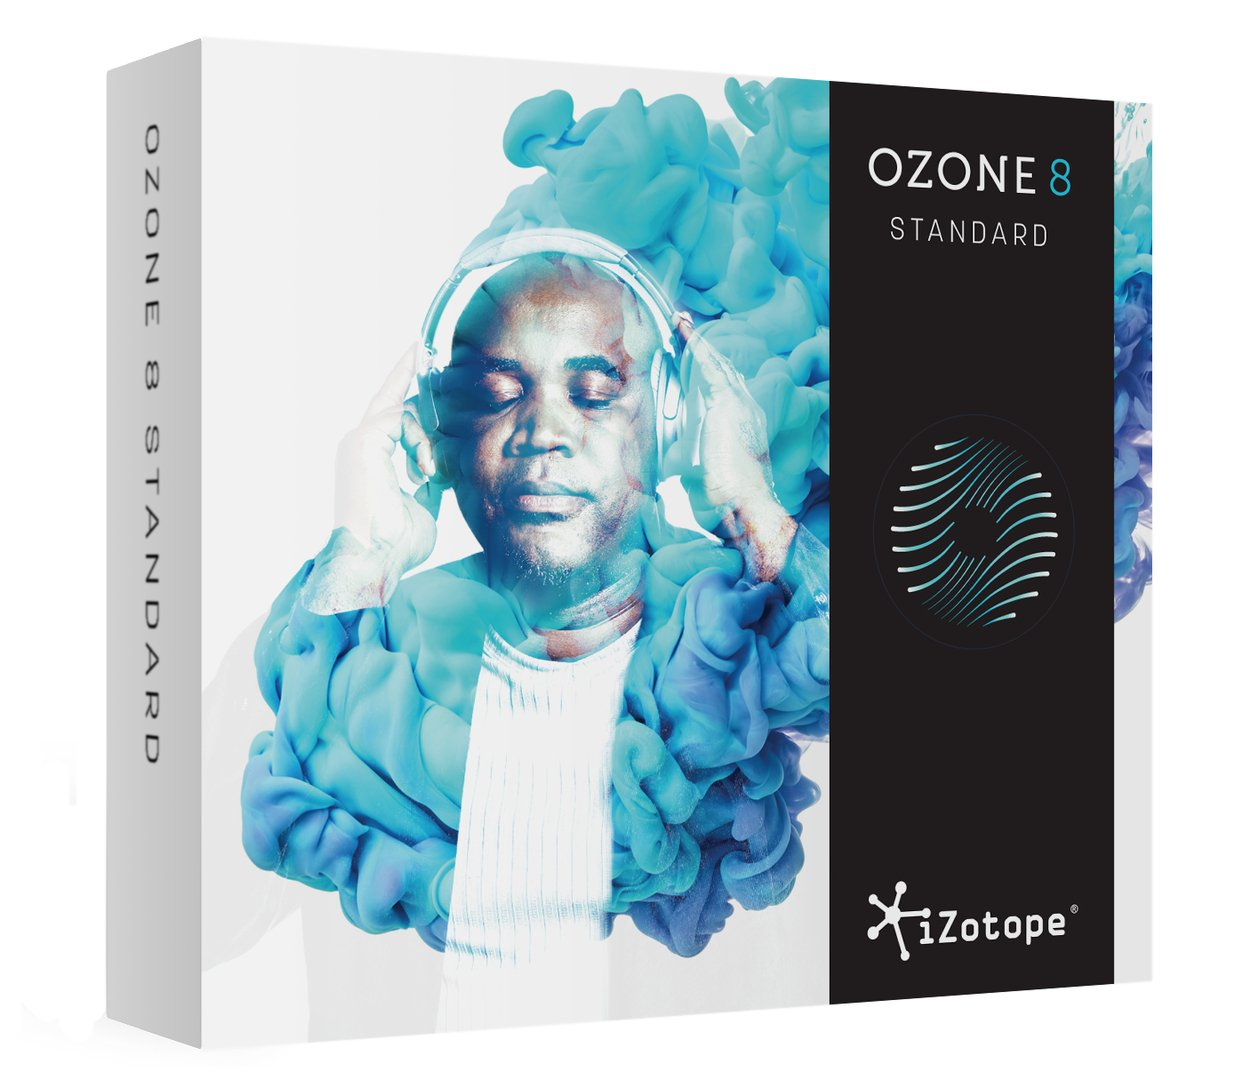 iZotope Ozone 8 Instant Rebate